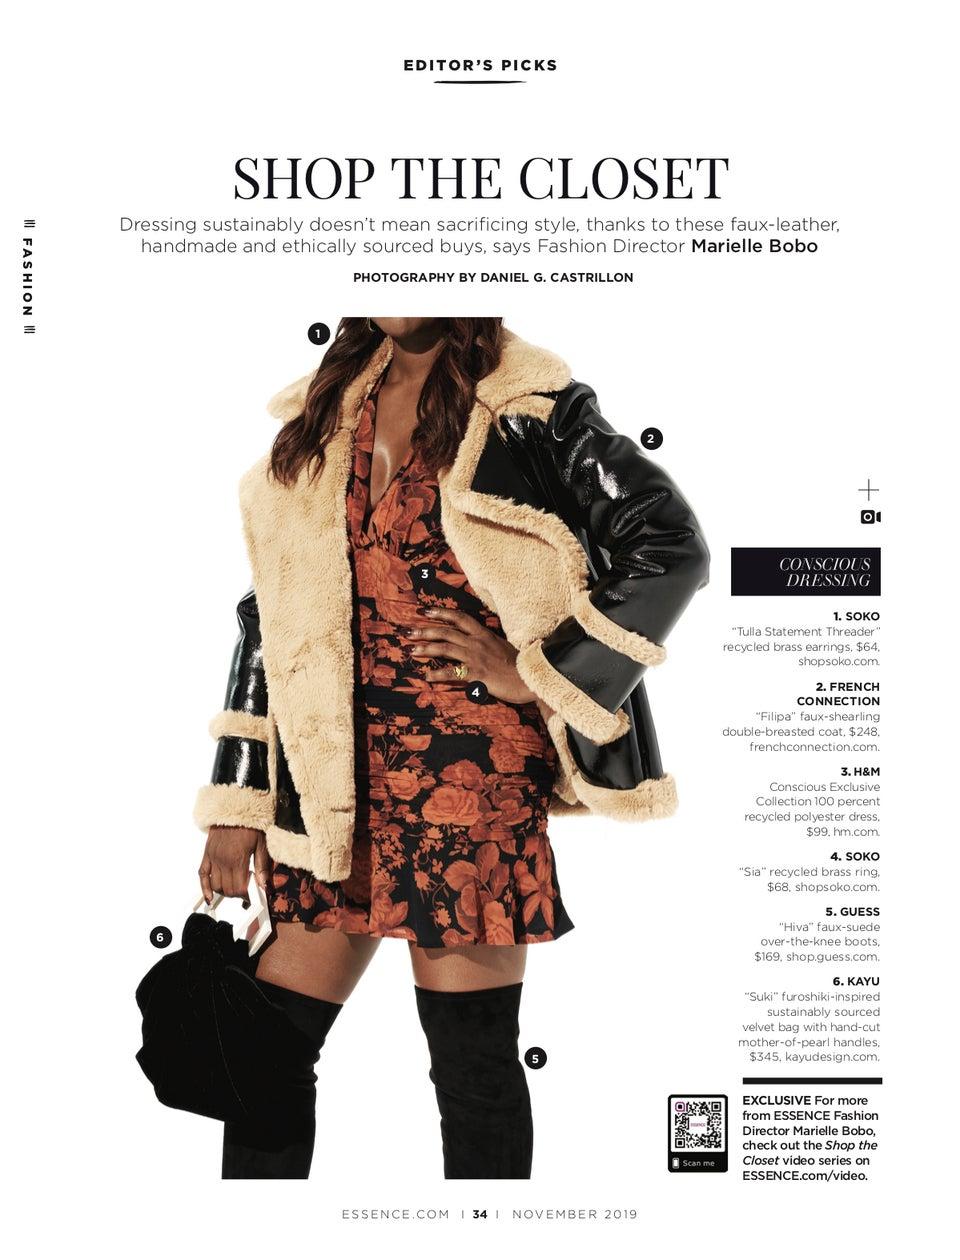 Shop The Closet: Embrace The Art Of Conscious Dressing